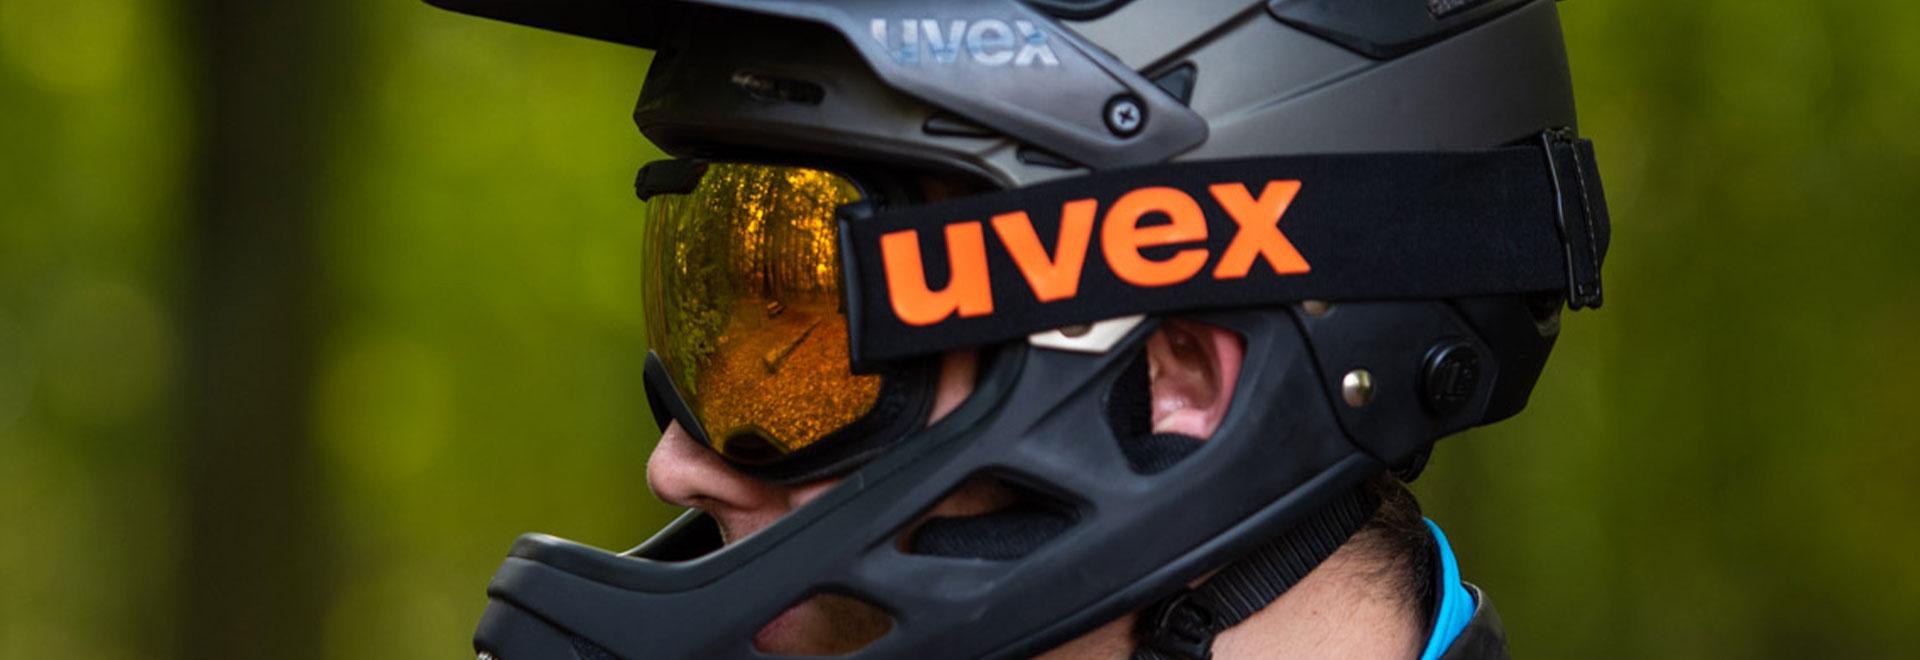 Uvex Downhill 2000 CV Freeride Goggle